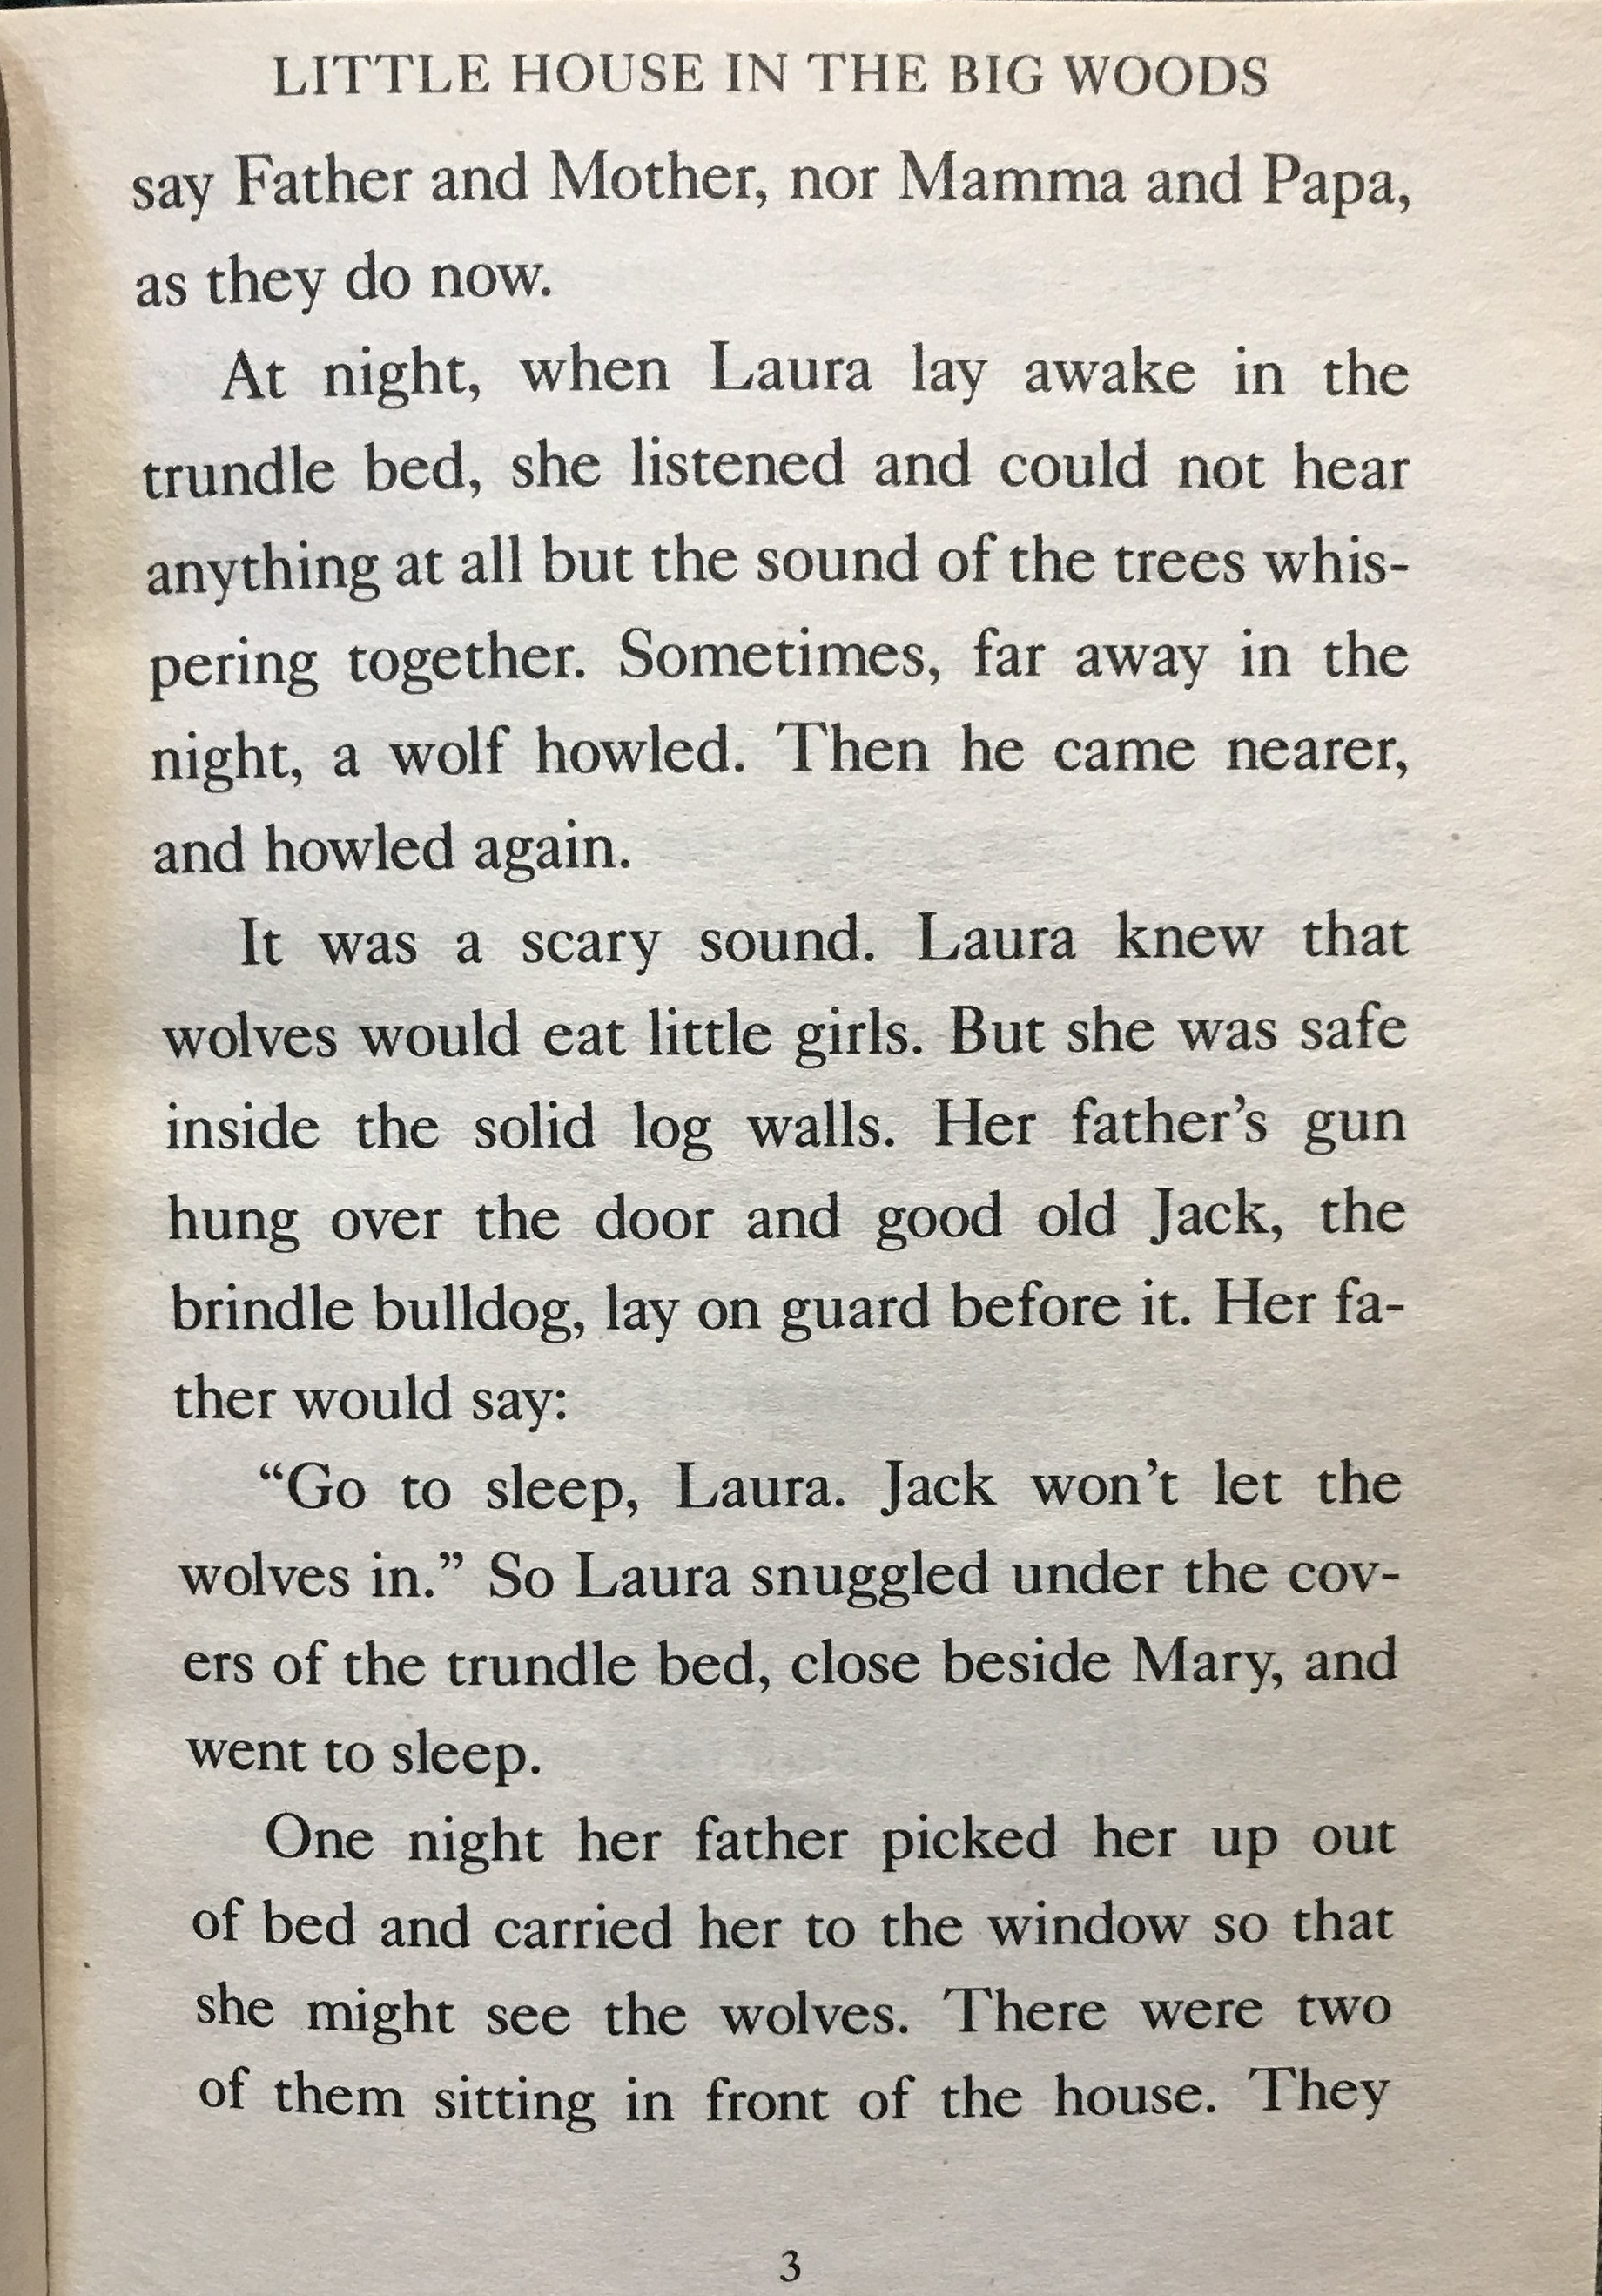 Little House Excerpt 3.JPG